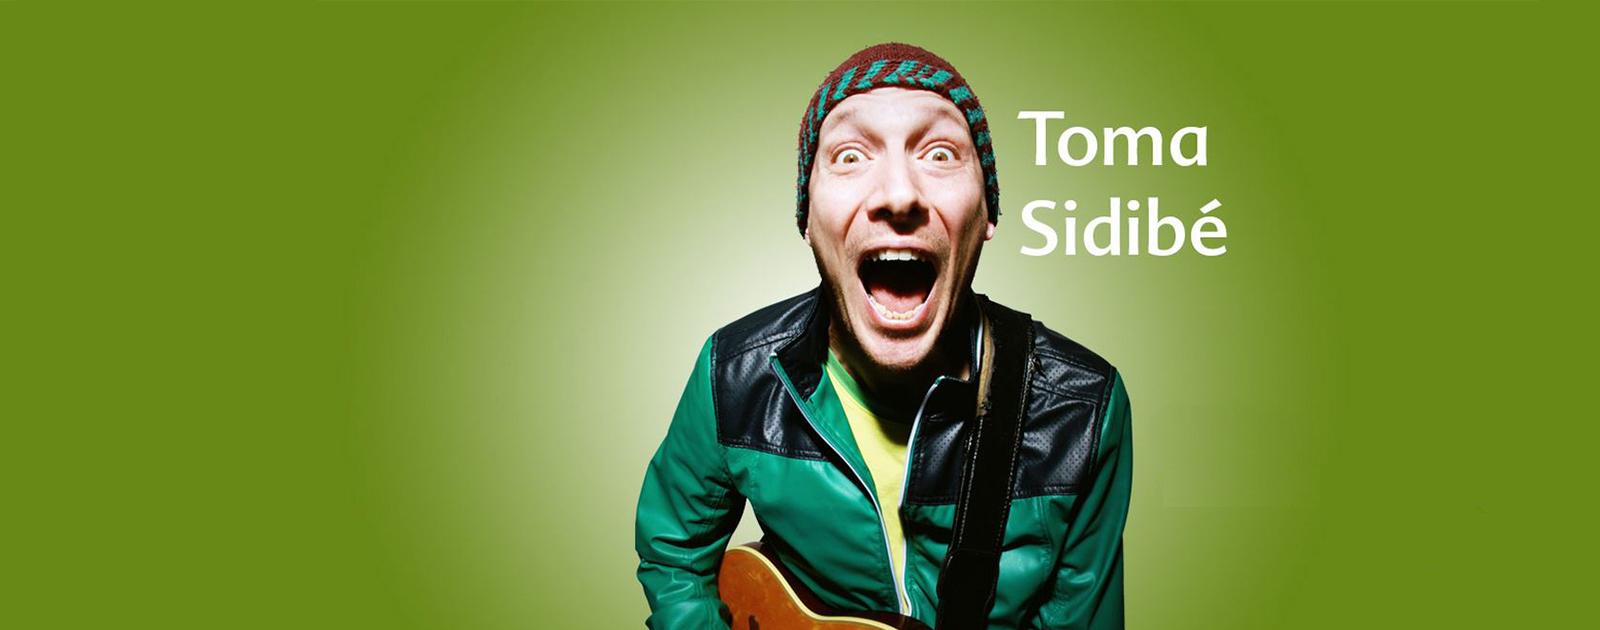 Samedi acoustique: Toma Sidibé